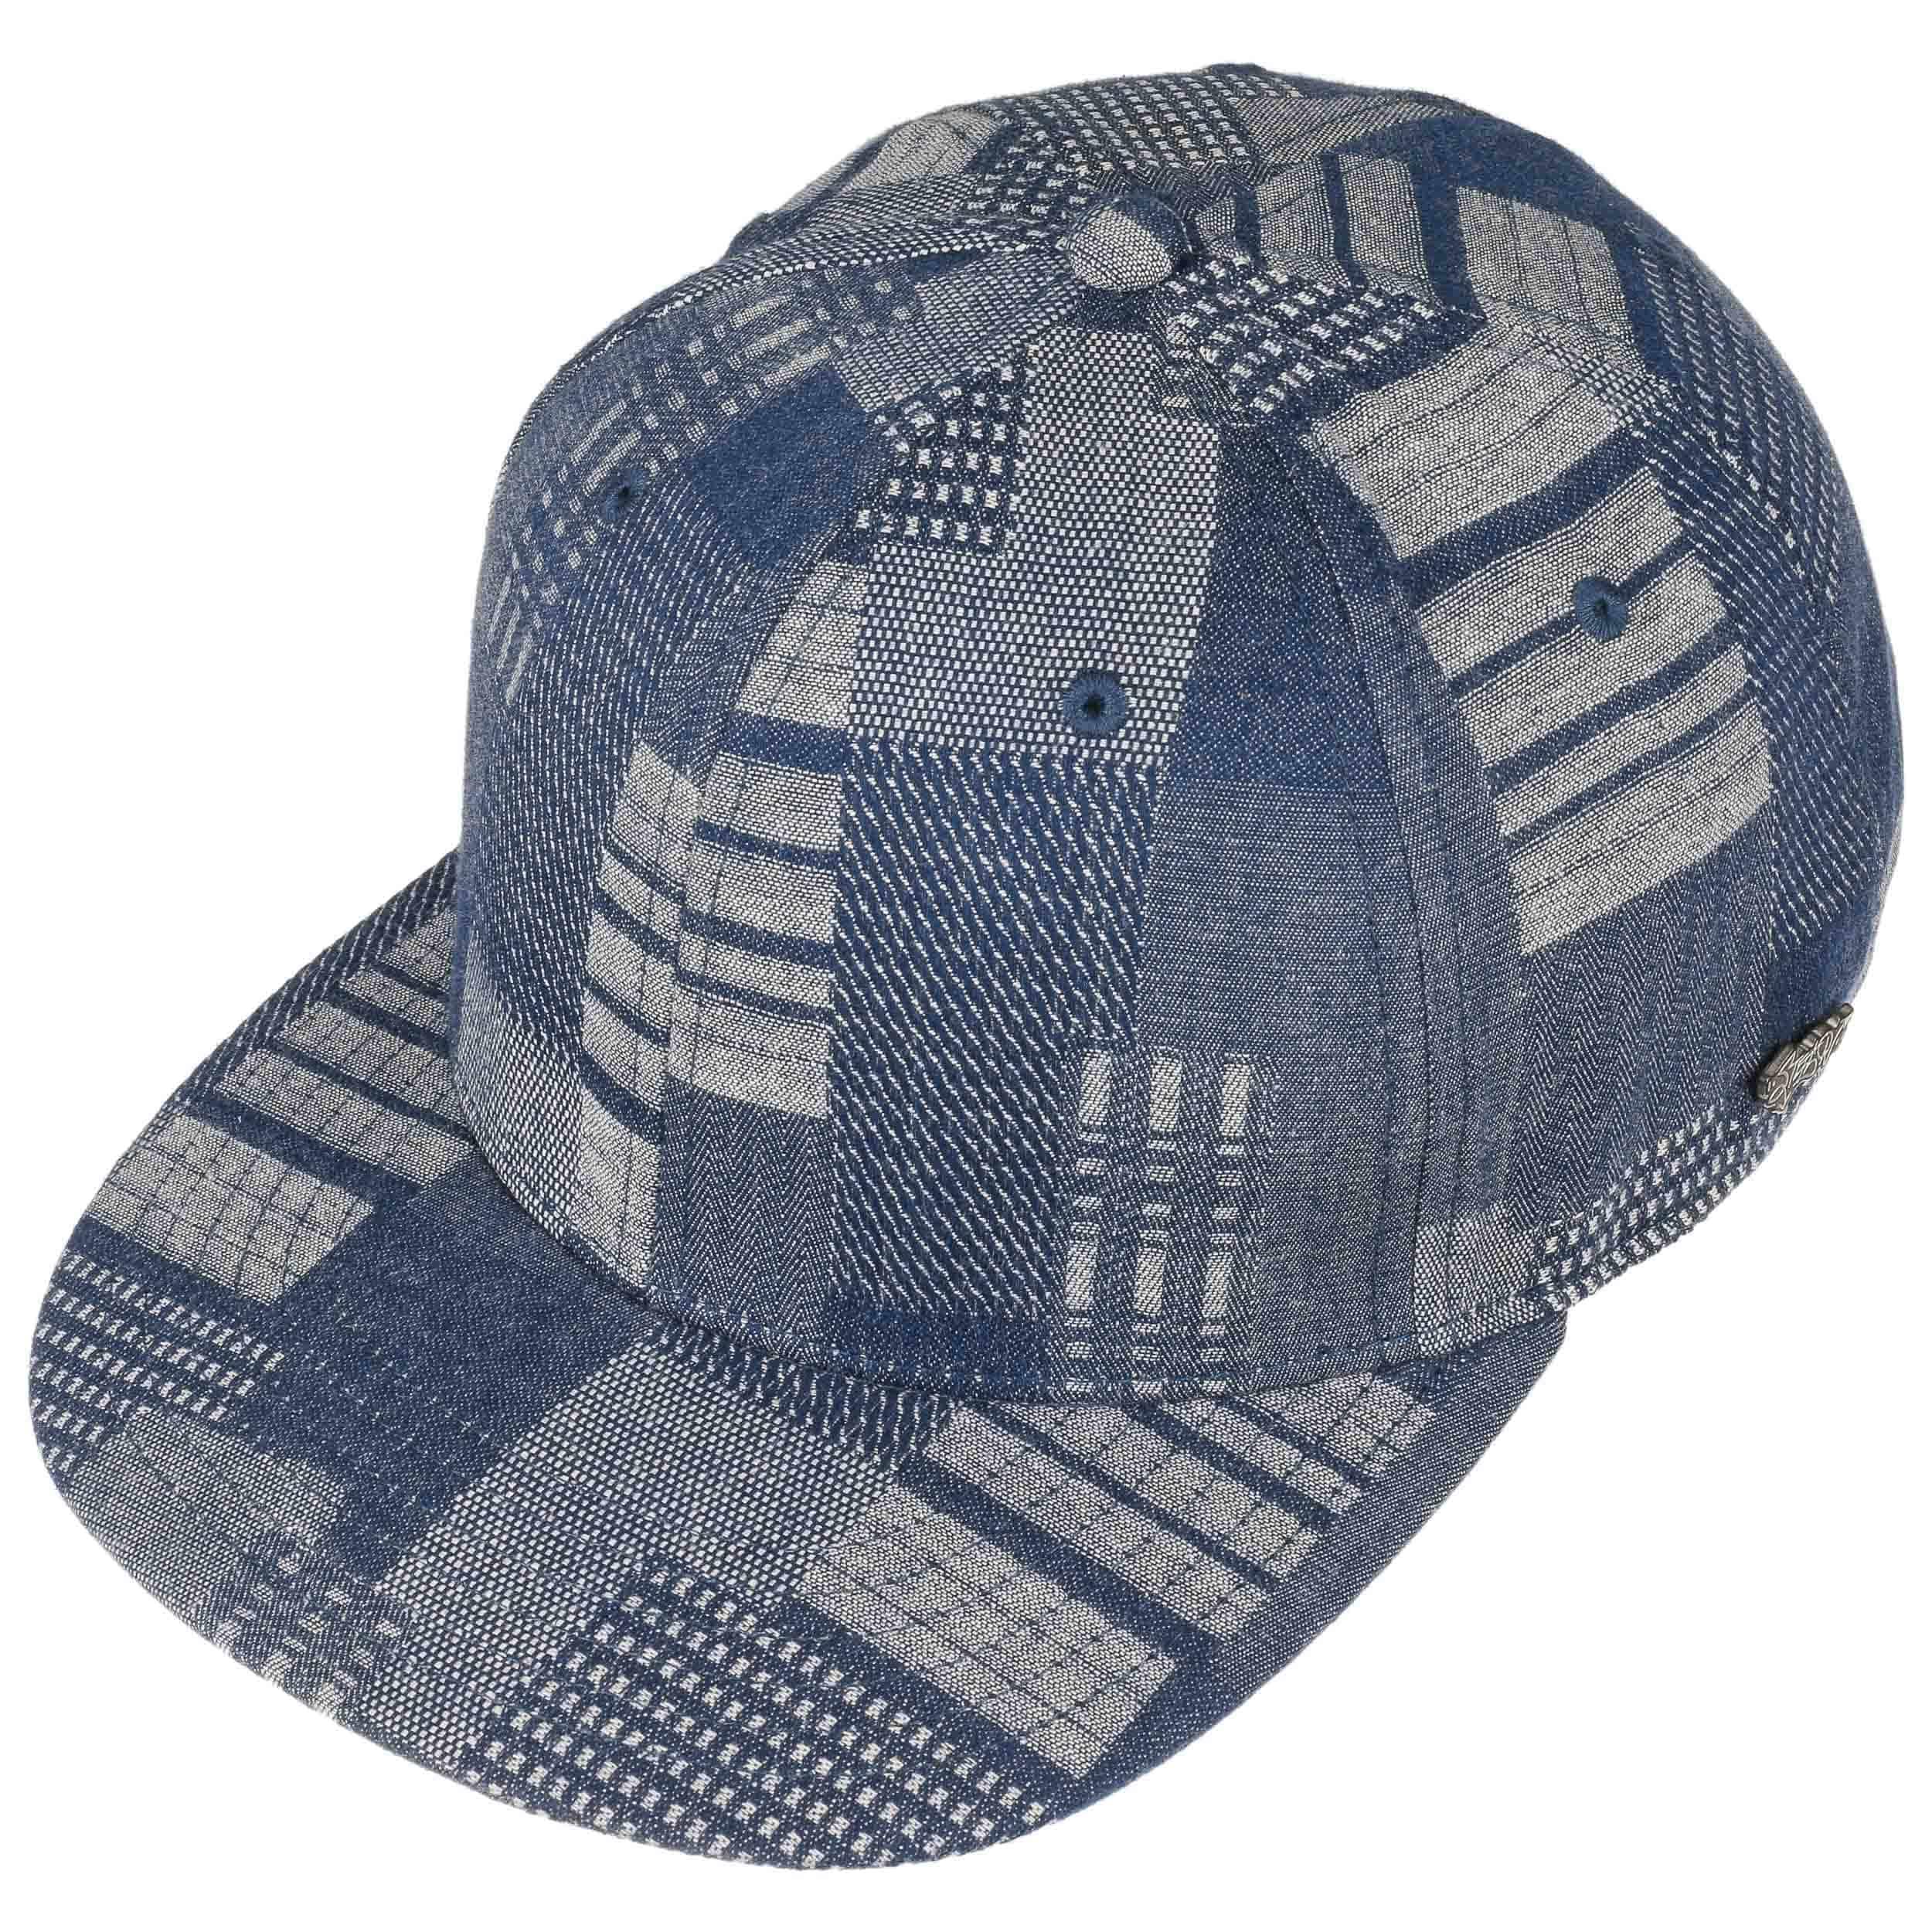 Gorra Denim Patchwork by Stetson - Gorras - sombreroshop.es f5af2bcdbab